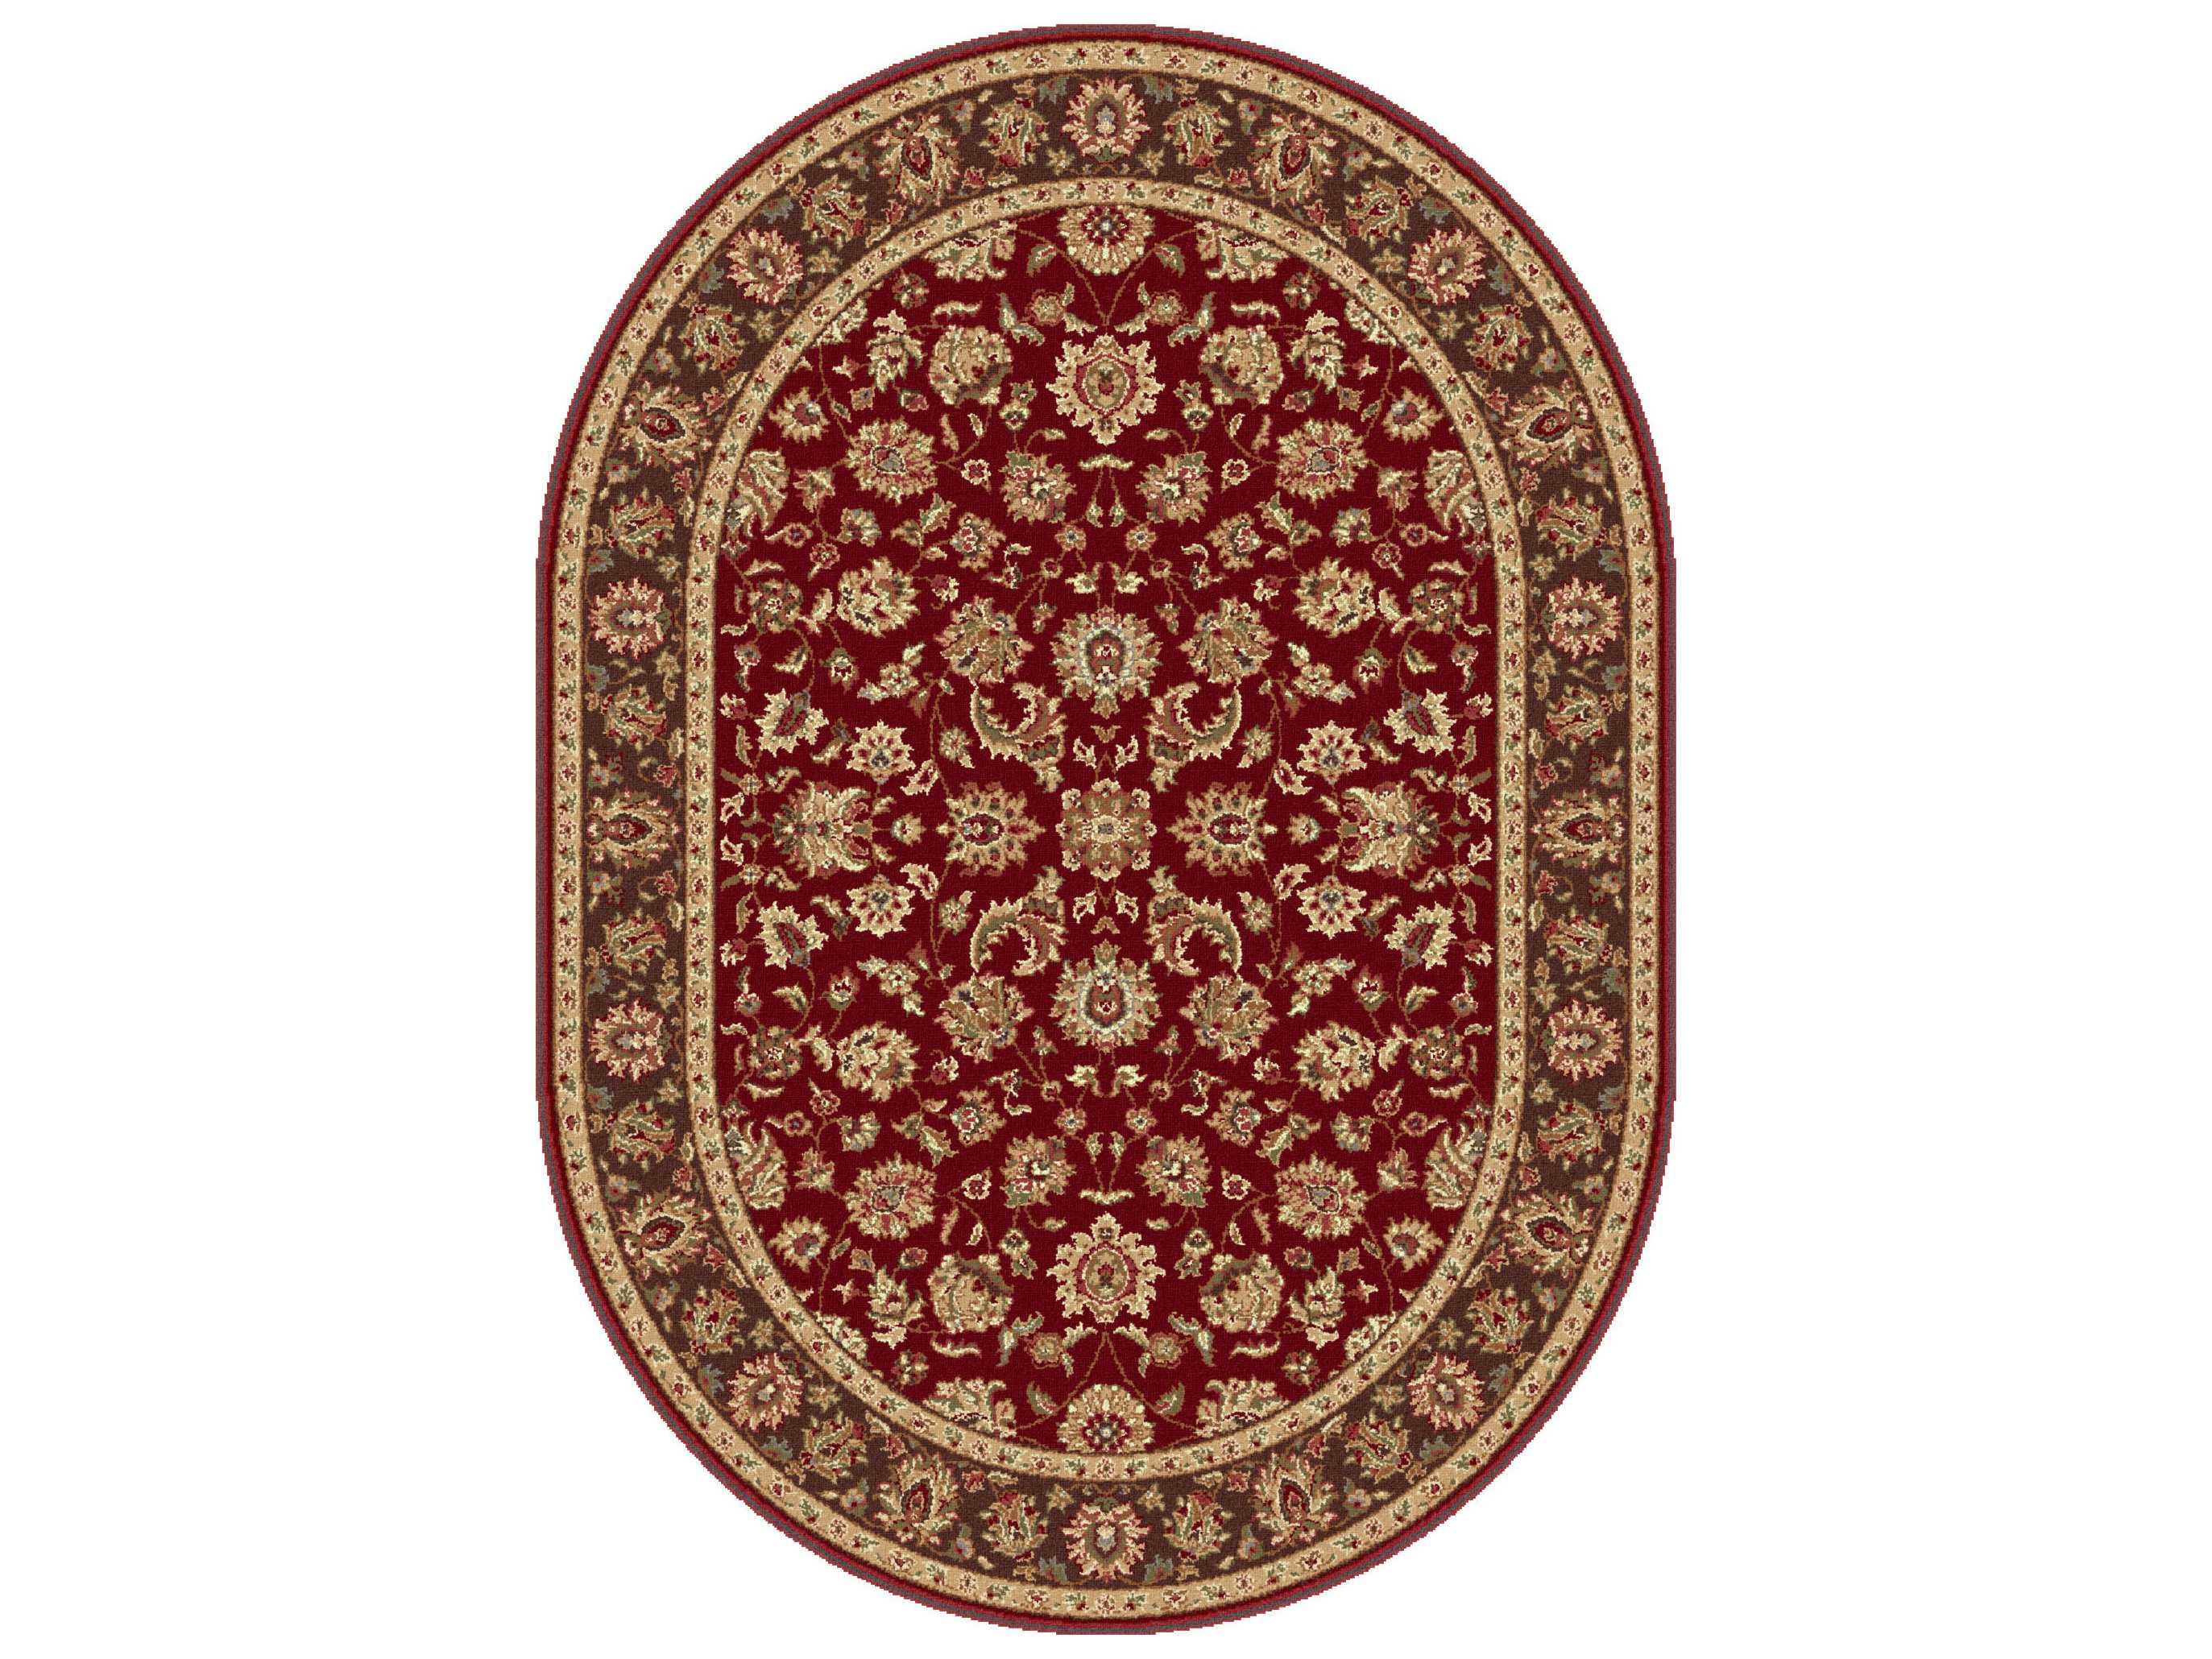 tayse rugs elegance davenport oval red area rug